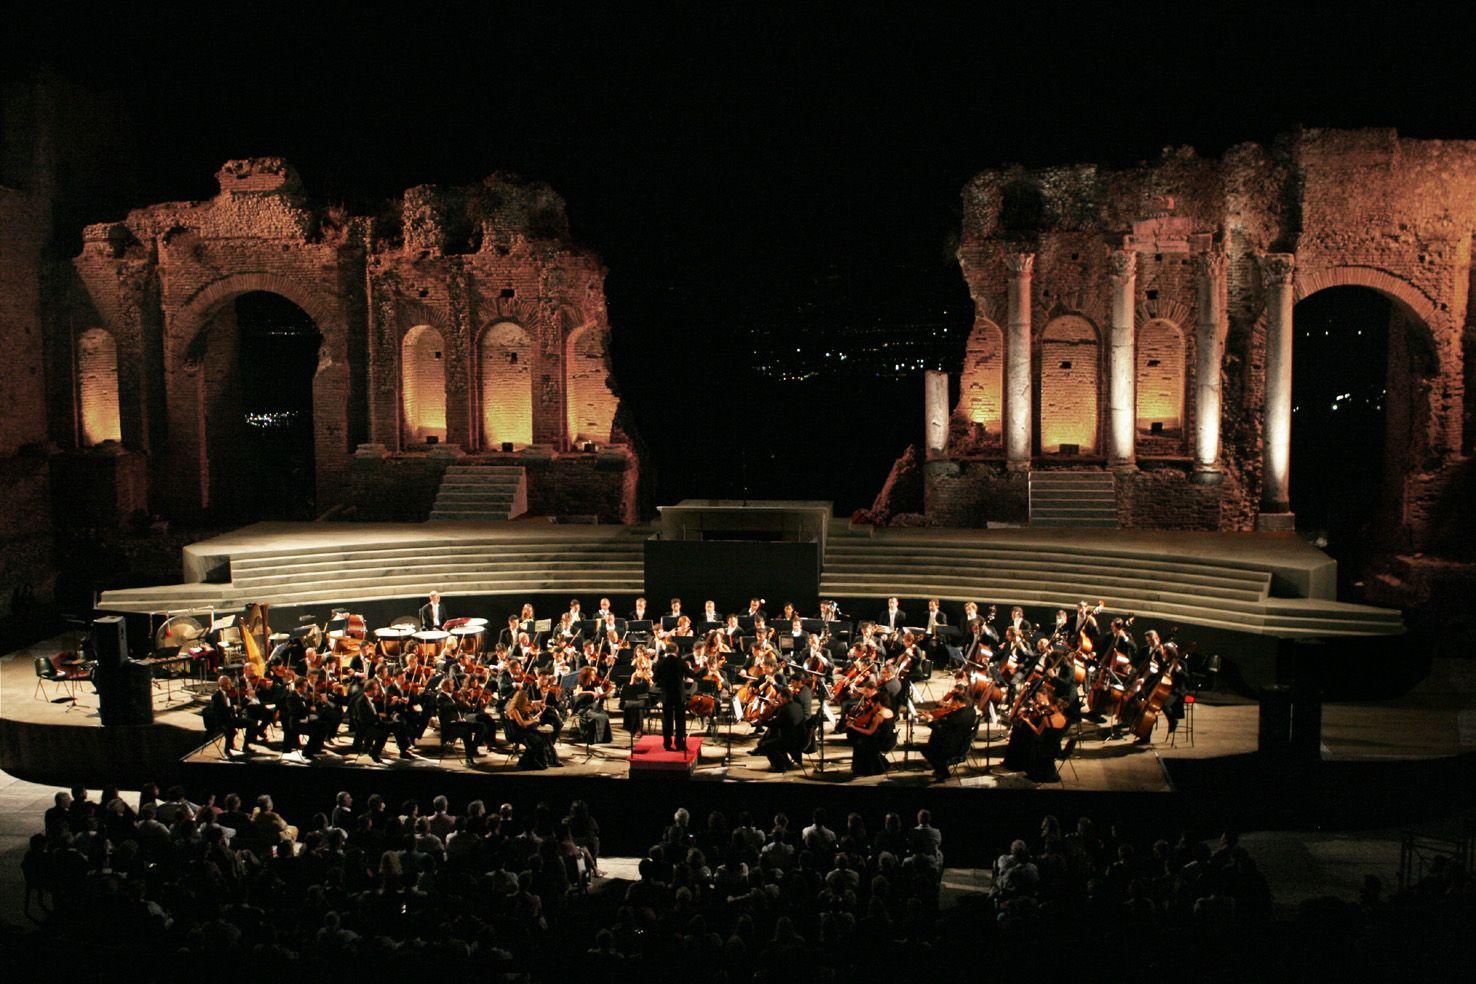 Symphonica Arturo Toscanini, directs Lorin Maazel. Teatro Antico in Taormina, Sicily.